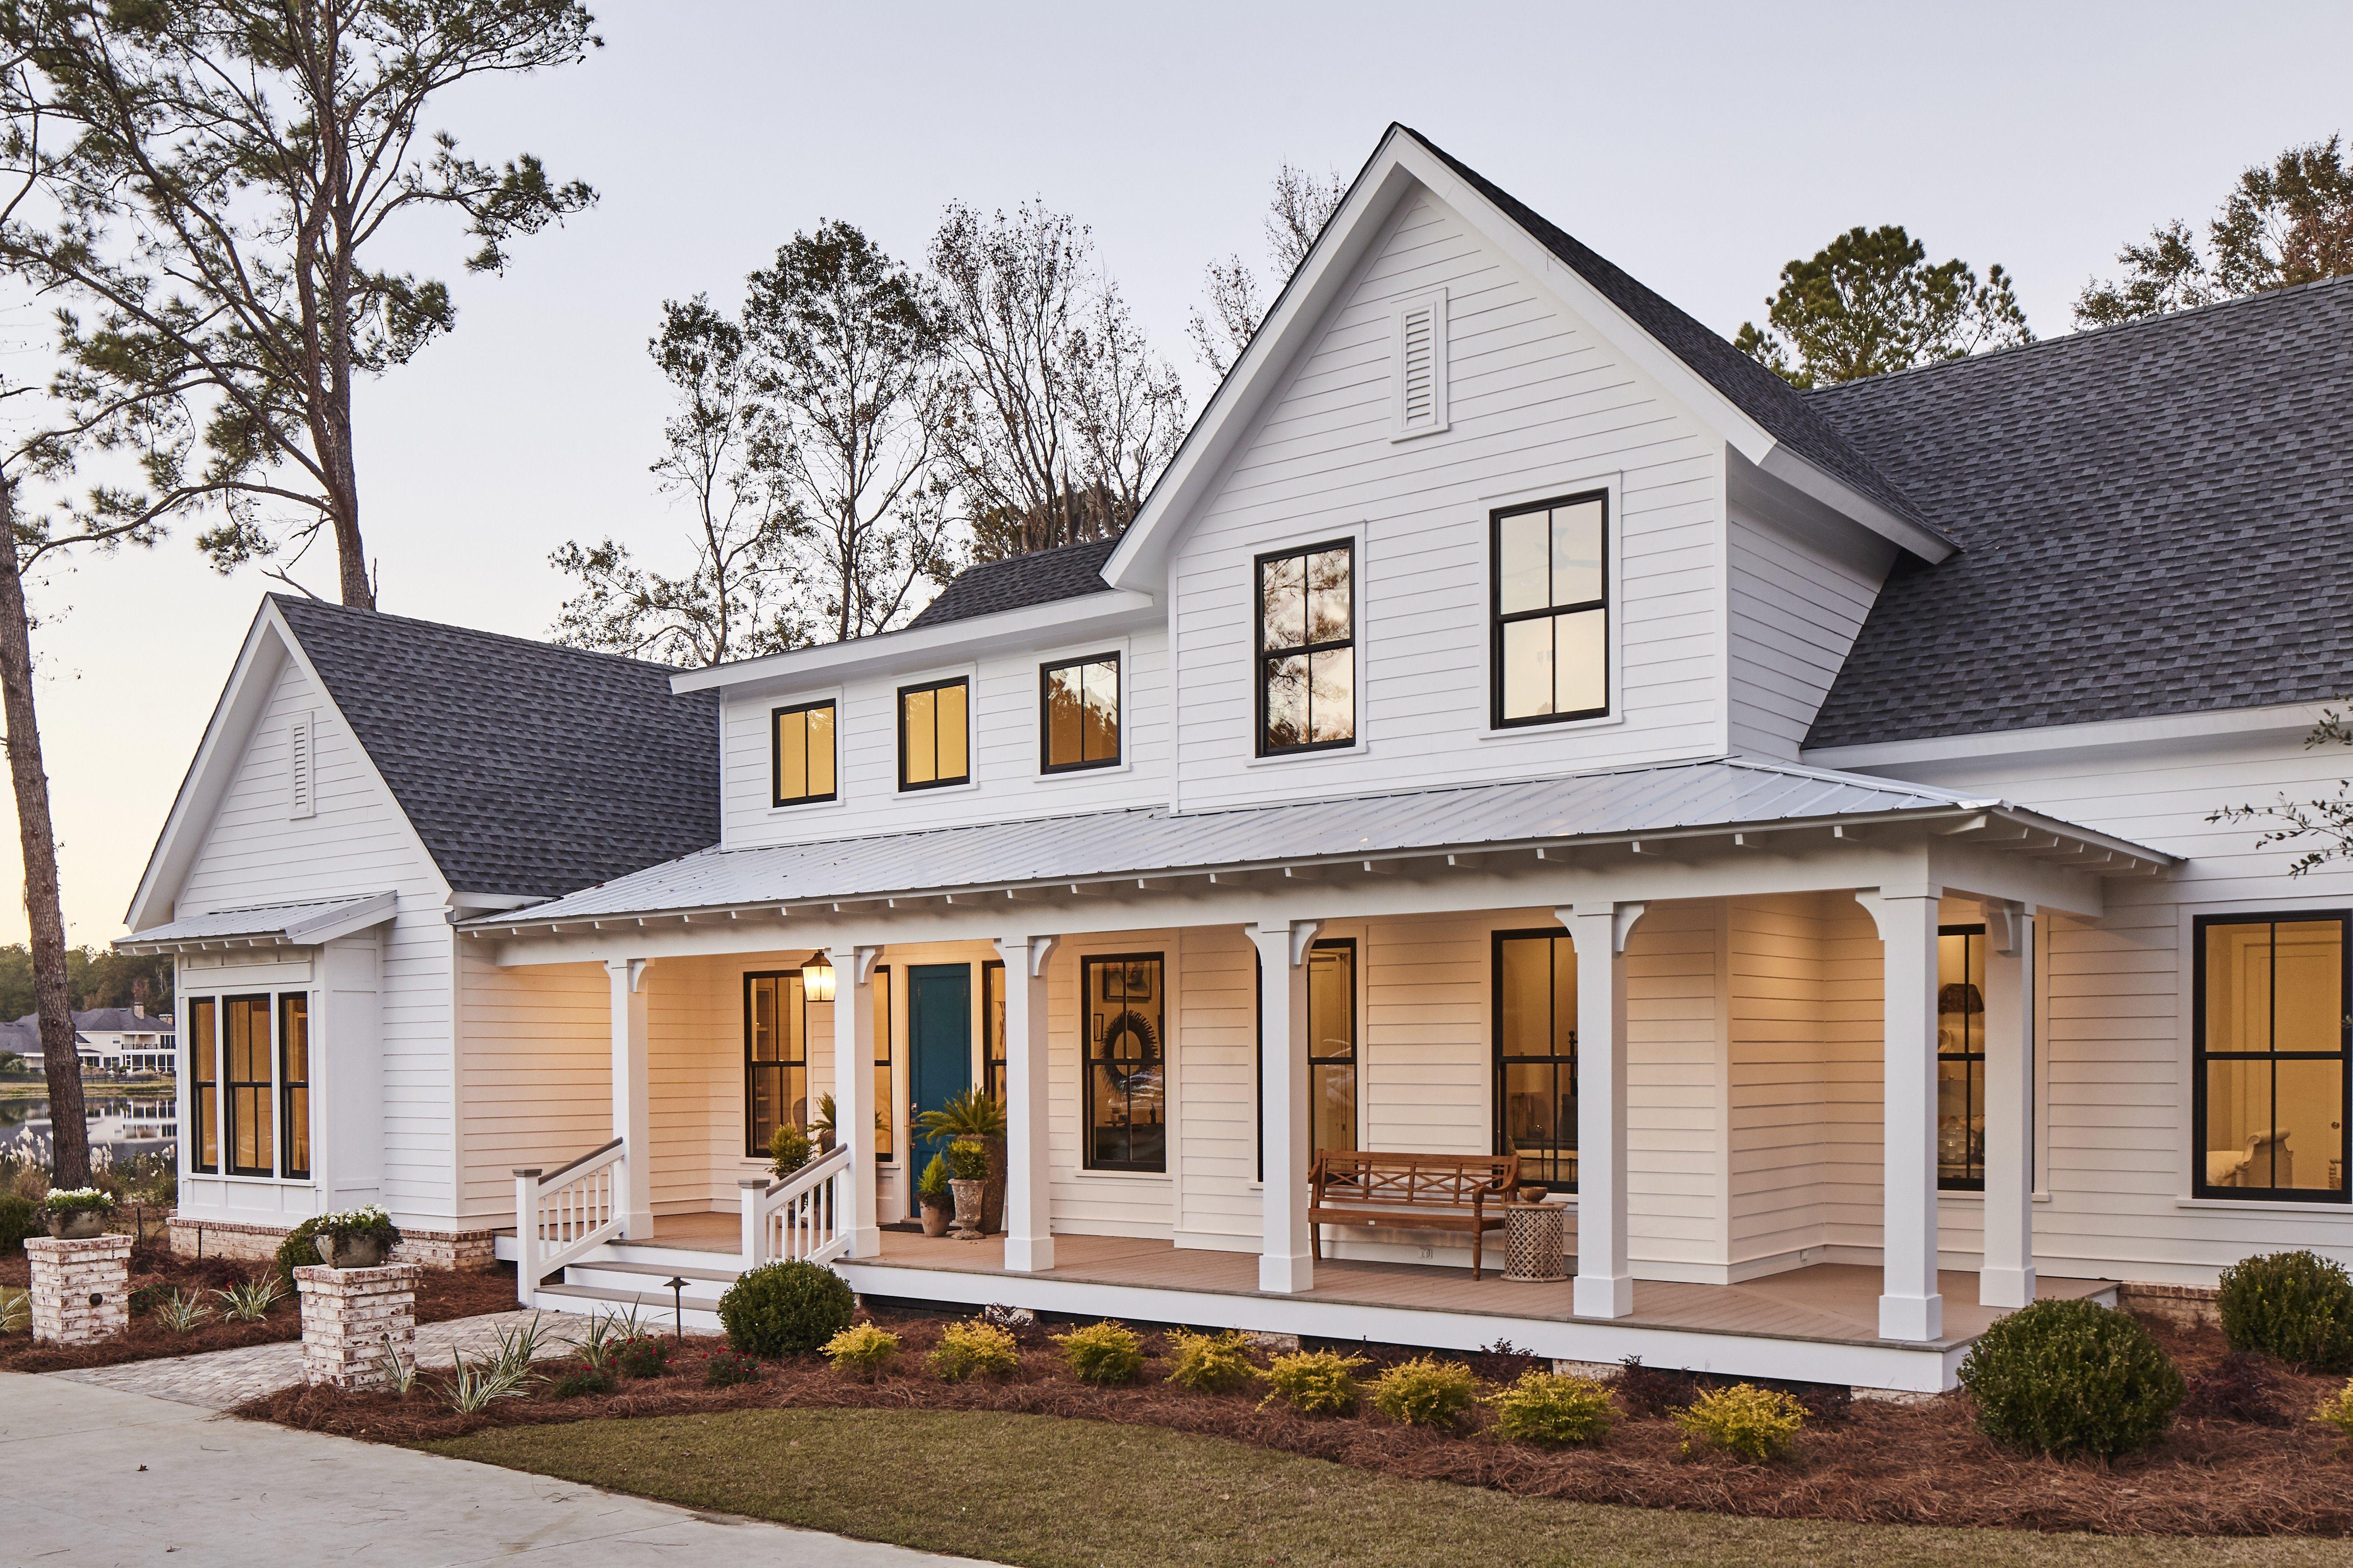 49 Lake House Design Lakeside Cottage Spanish Style Https Silahsilah Com Home De Southern House Plans Porch House Plans Southern Living House Plans Farmhouse